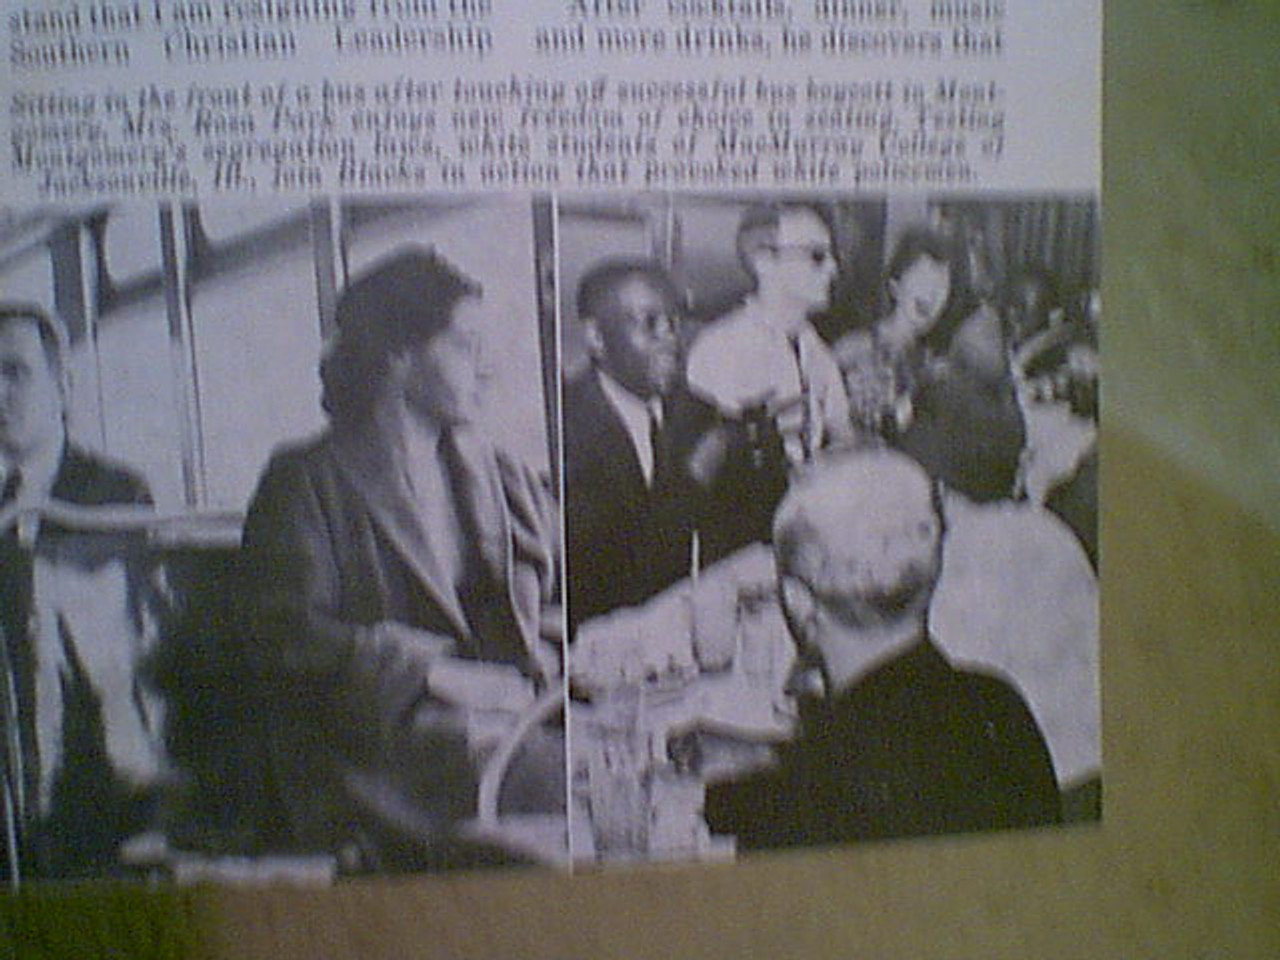 Abernathy, Ralph Jet Magazine 1973 Signed Autograph Color Cover Photo